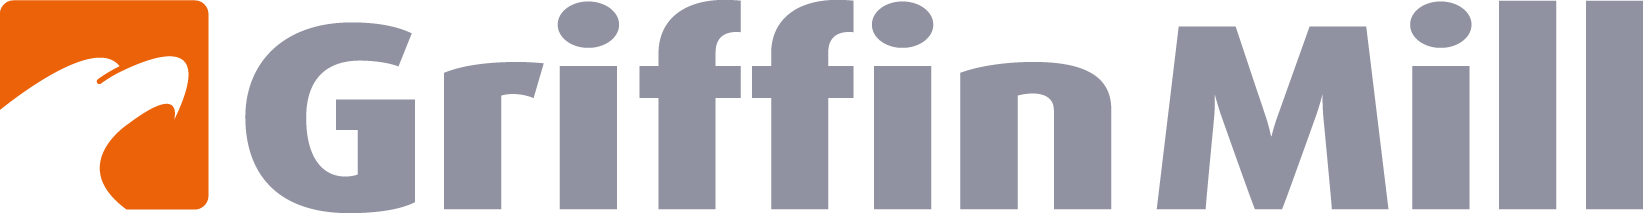 Griffin Mill Logo